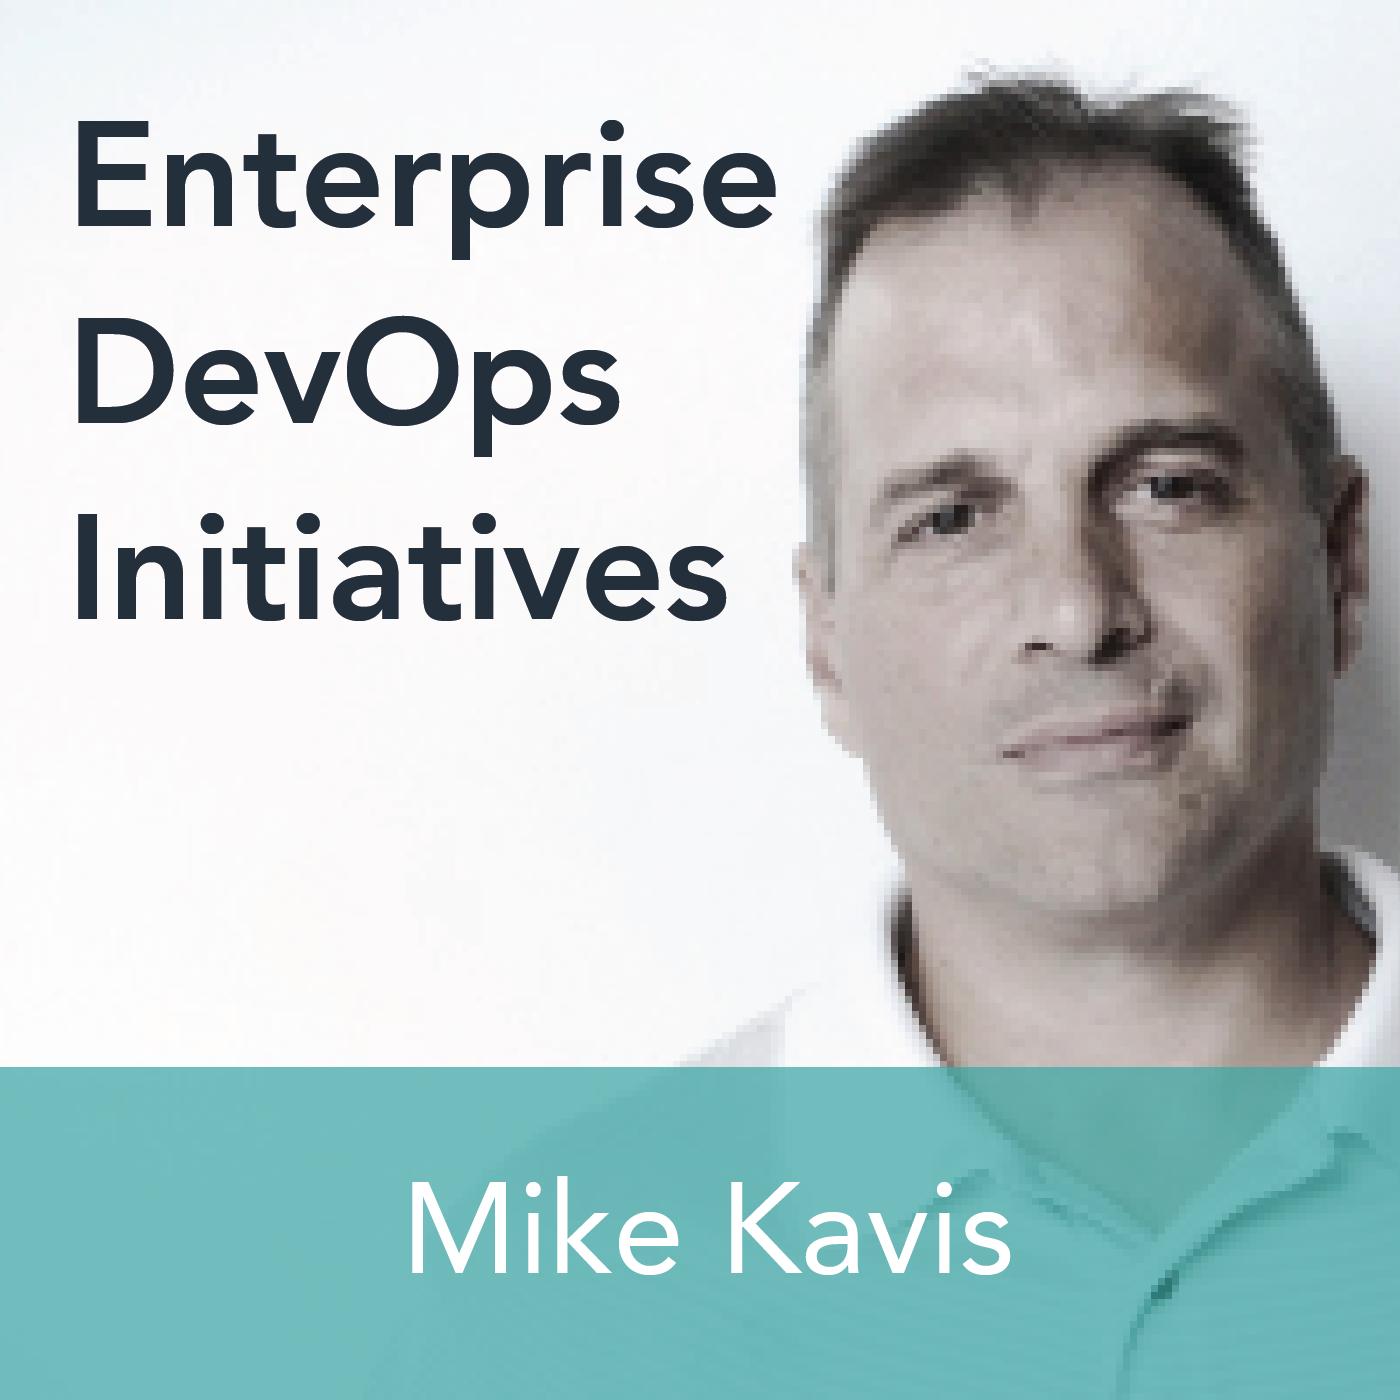 Enterprise Initiatives logo